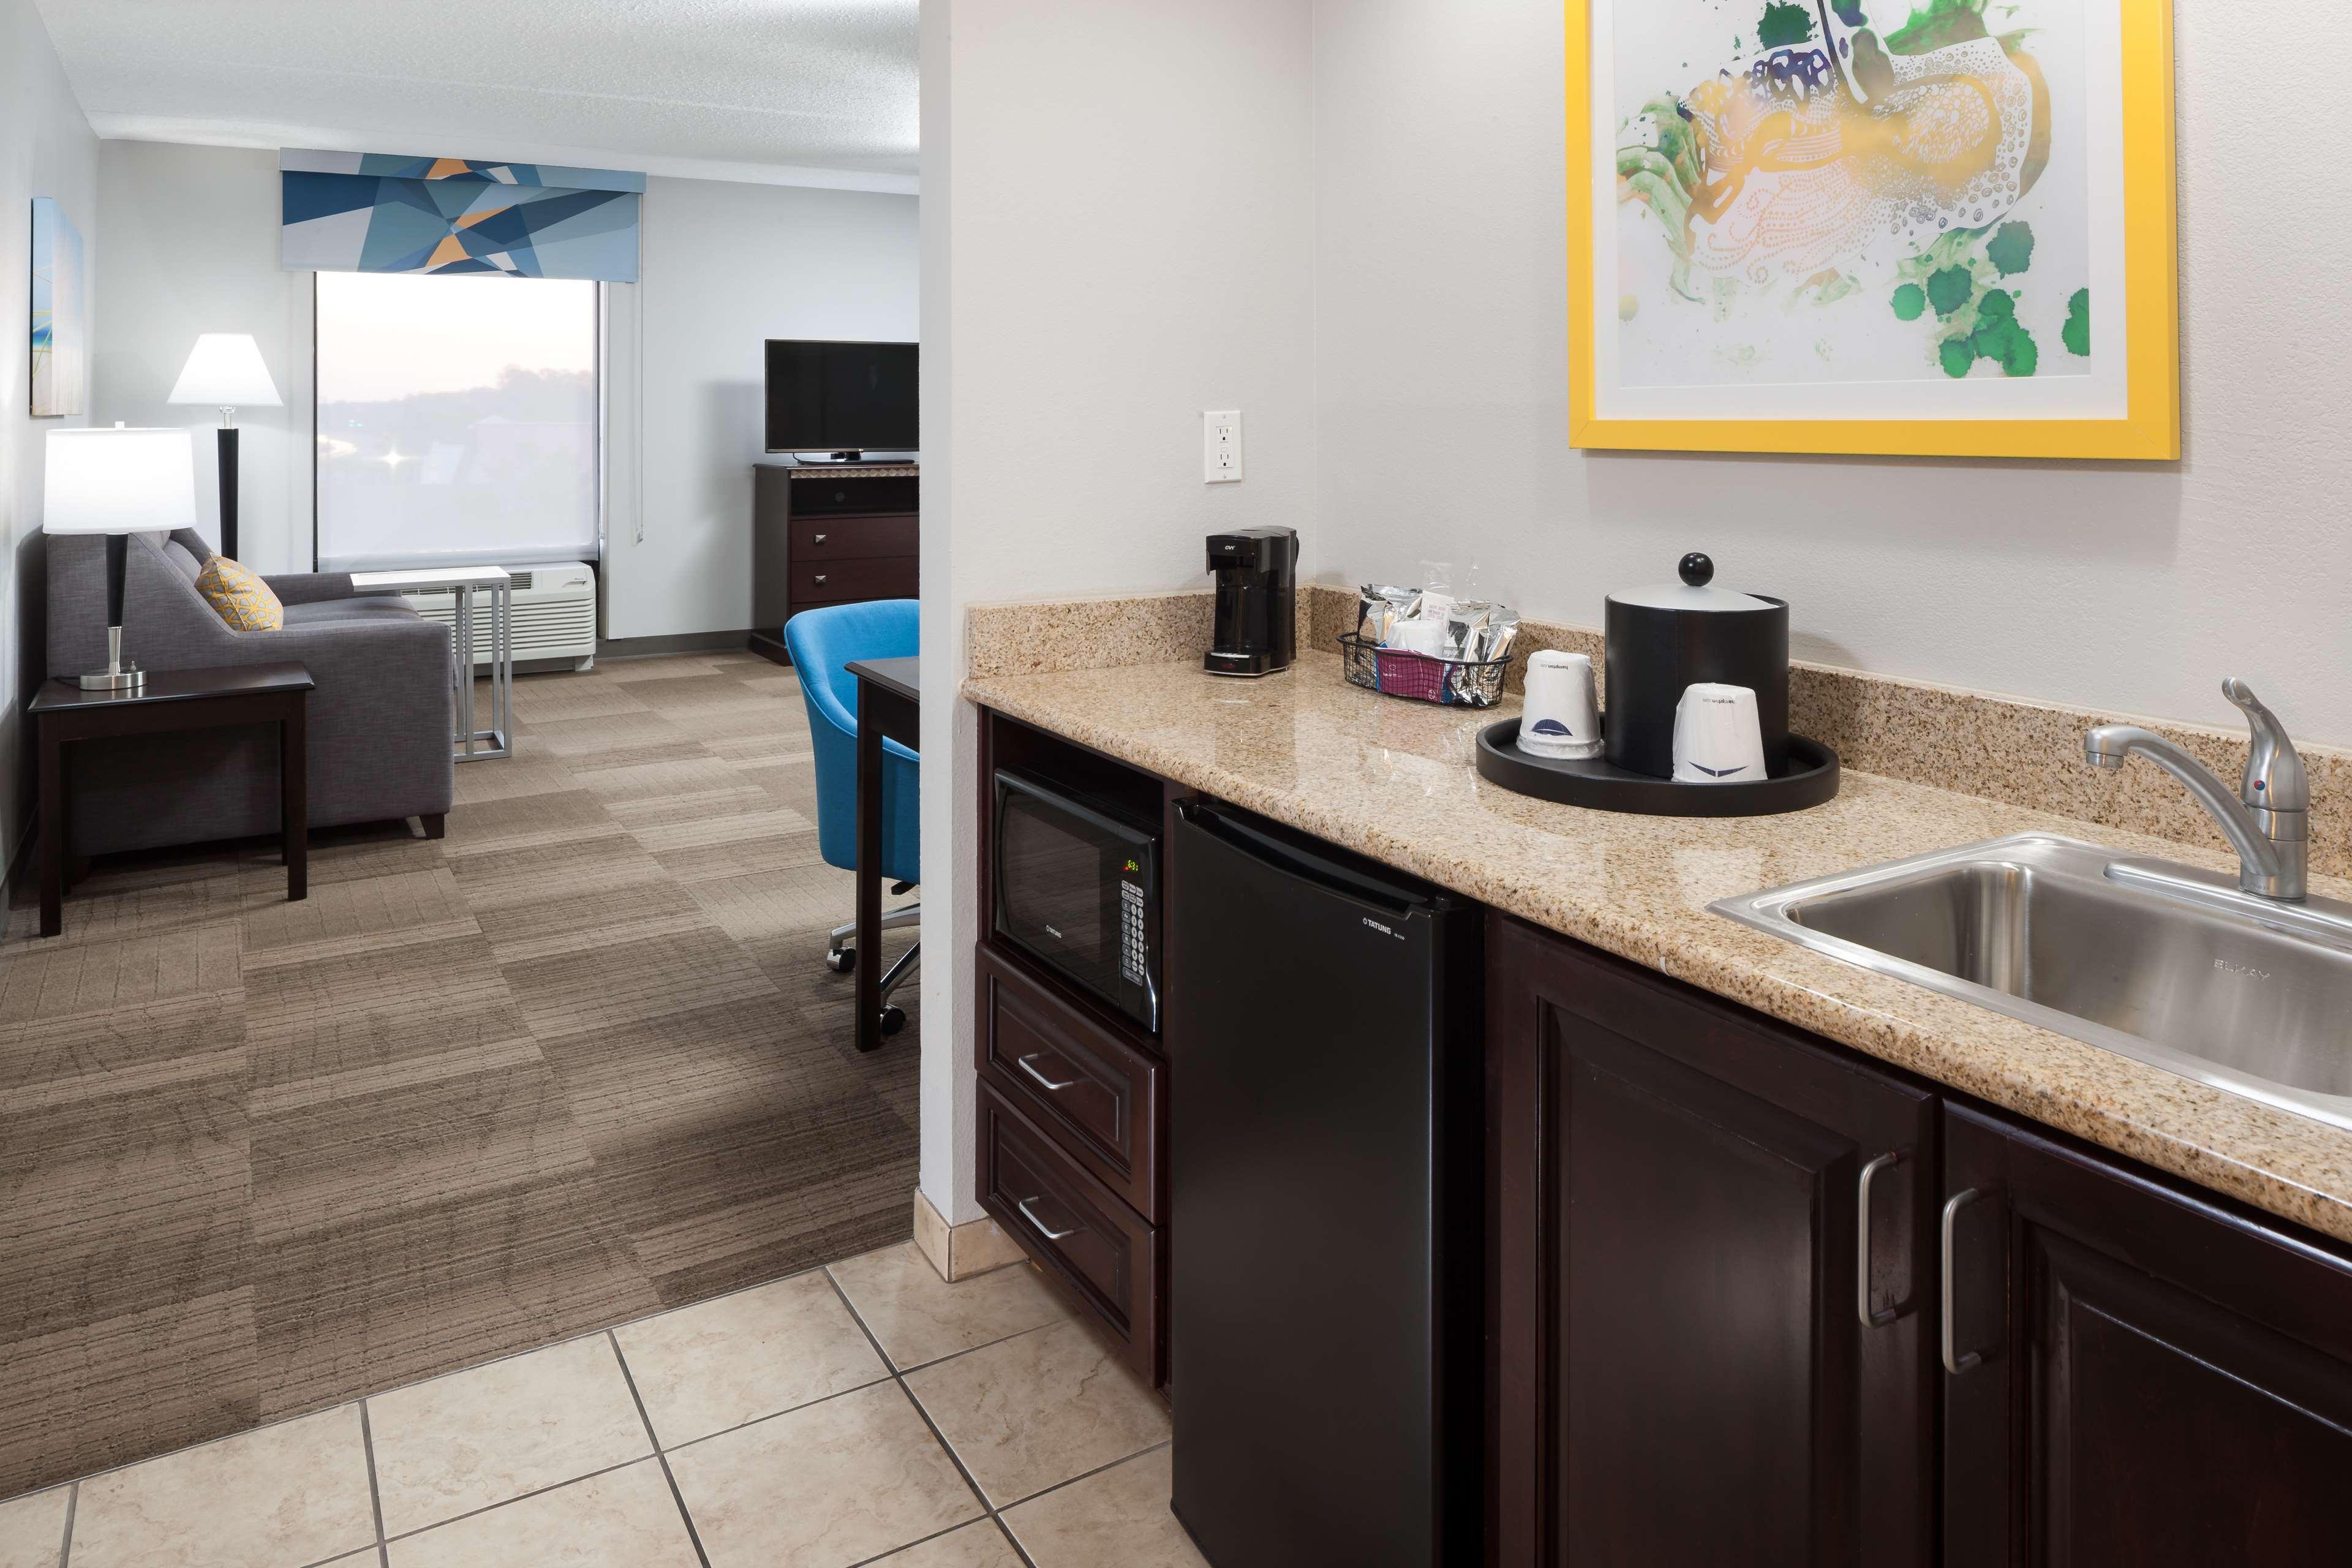 Hampton Inn & Suites Panama City Beach-Pier Park Area image 27